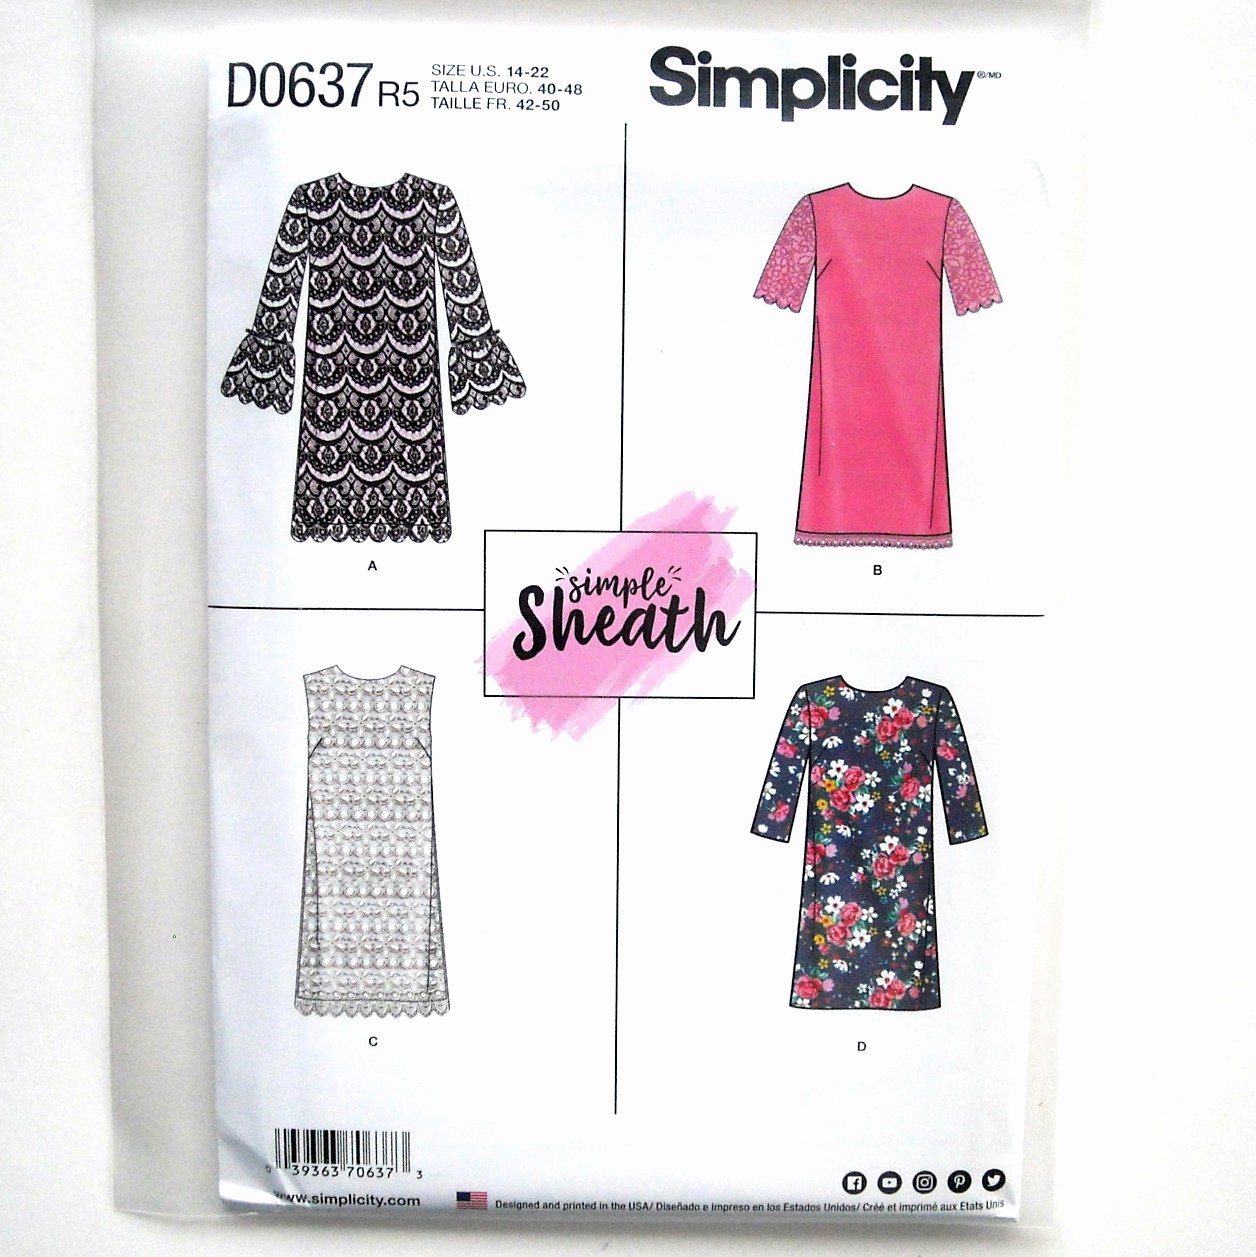 Misses Miss Petite Dresses 14 - 22 Simplicity Sewing Pattern D0637